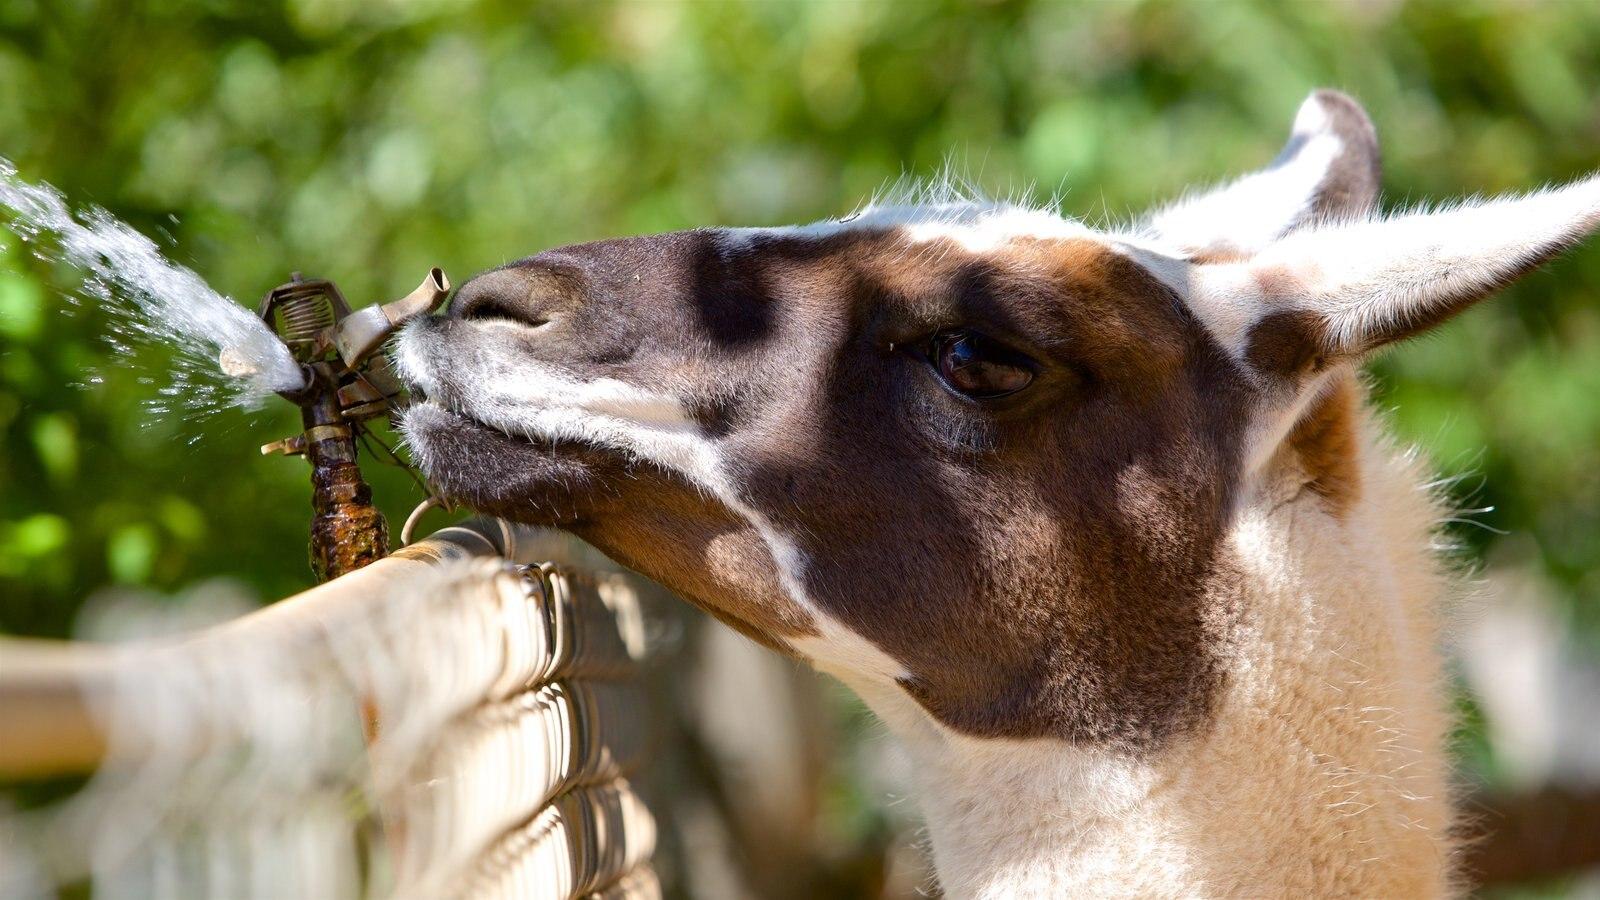 West Coast Game Park Safari caracterizando animais fofos ou amigáveis e animais de zoológico